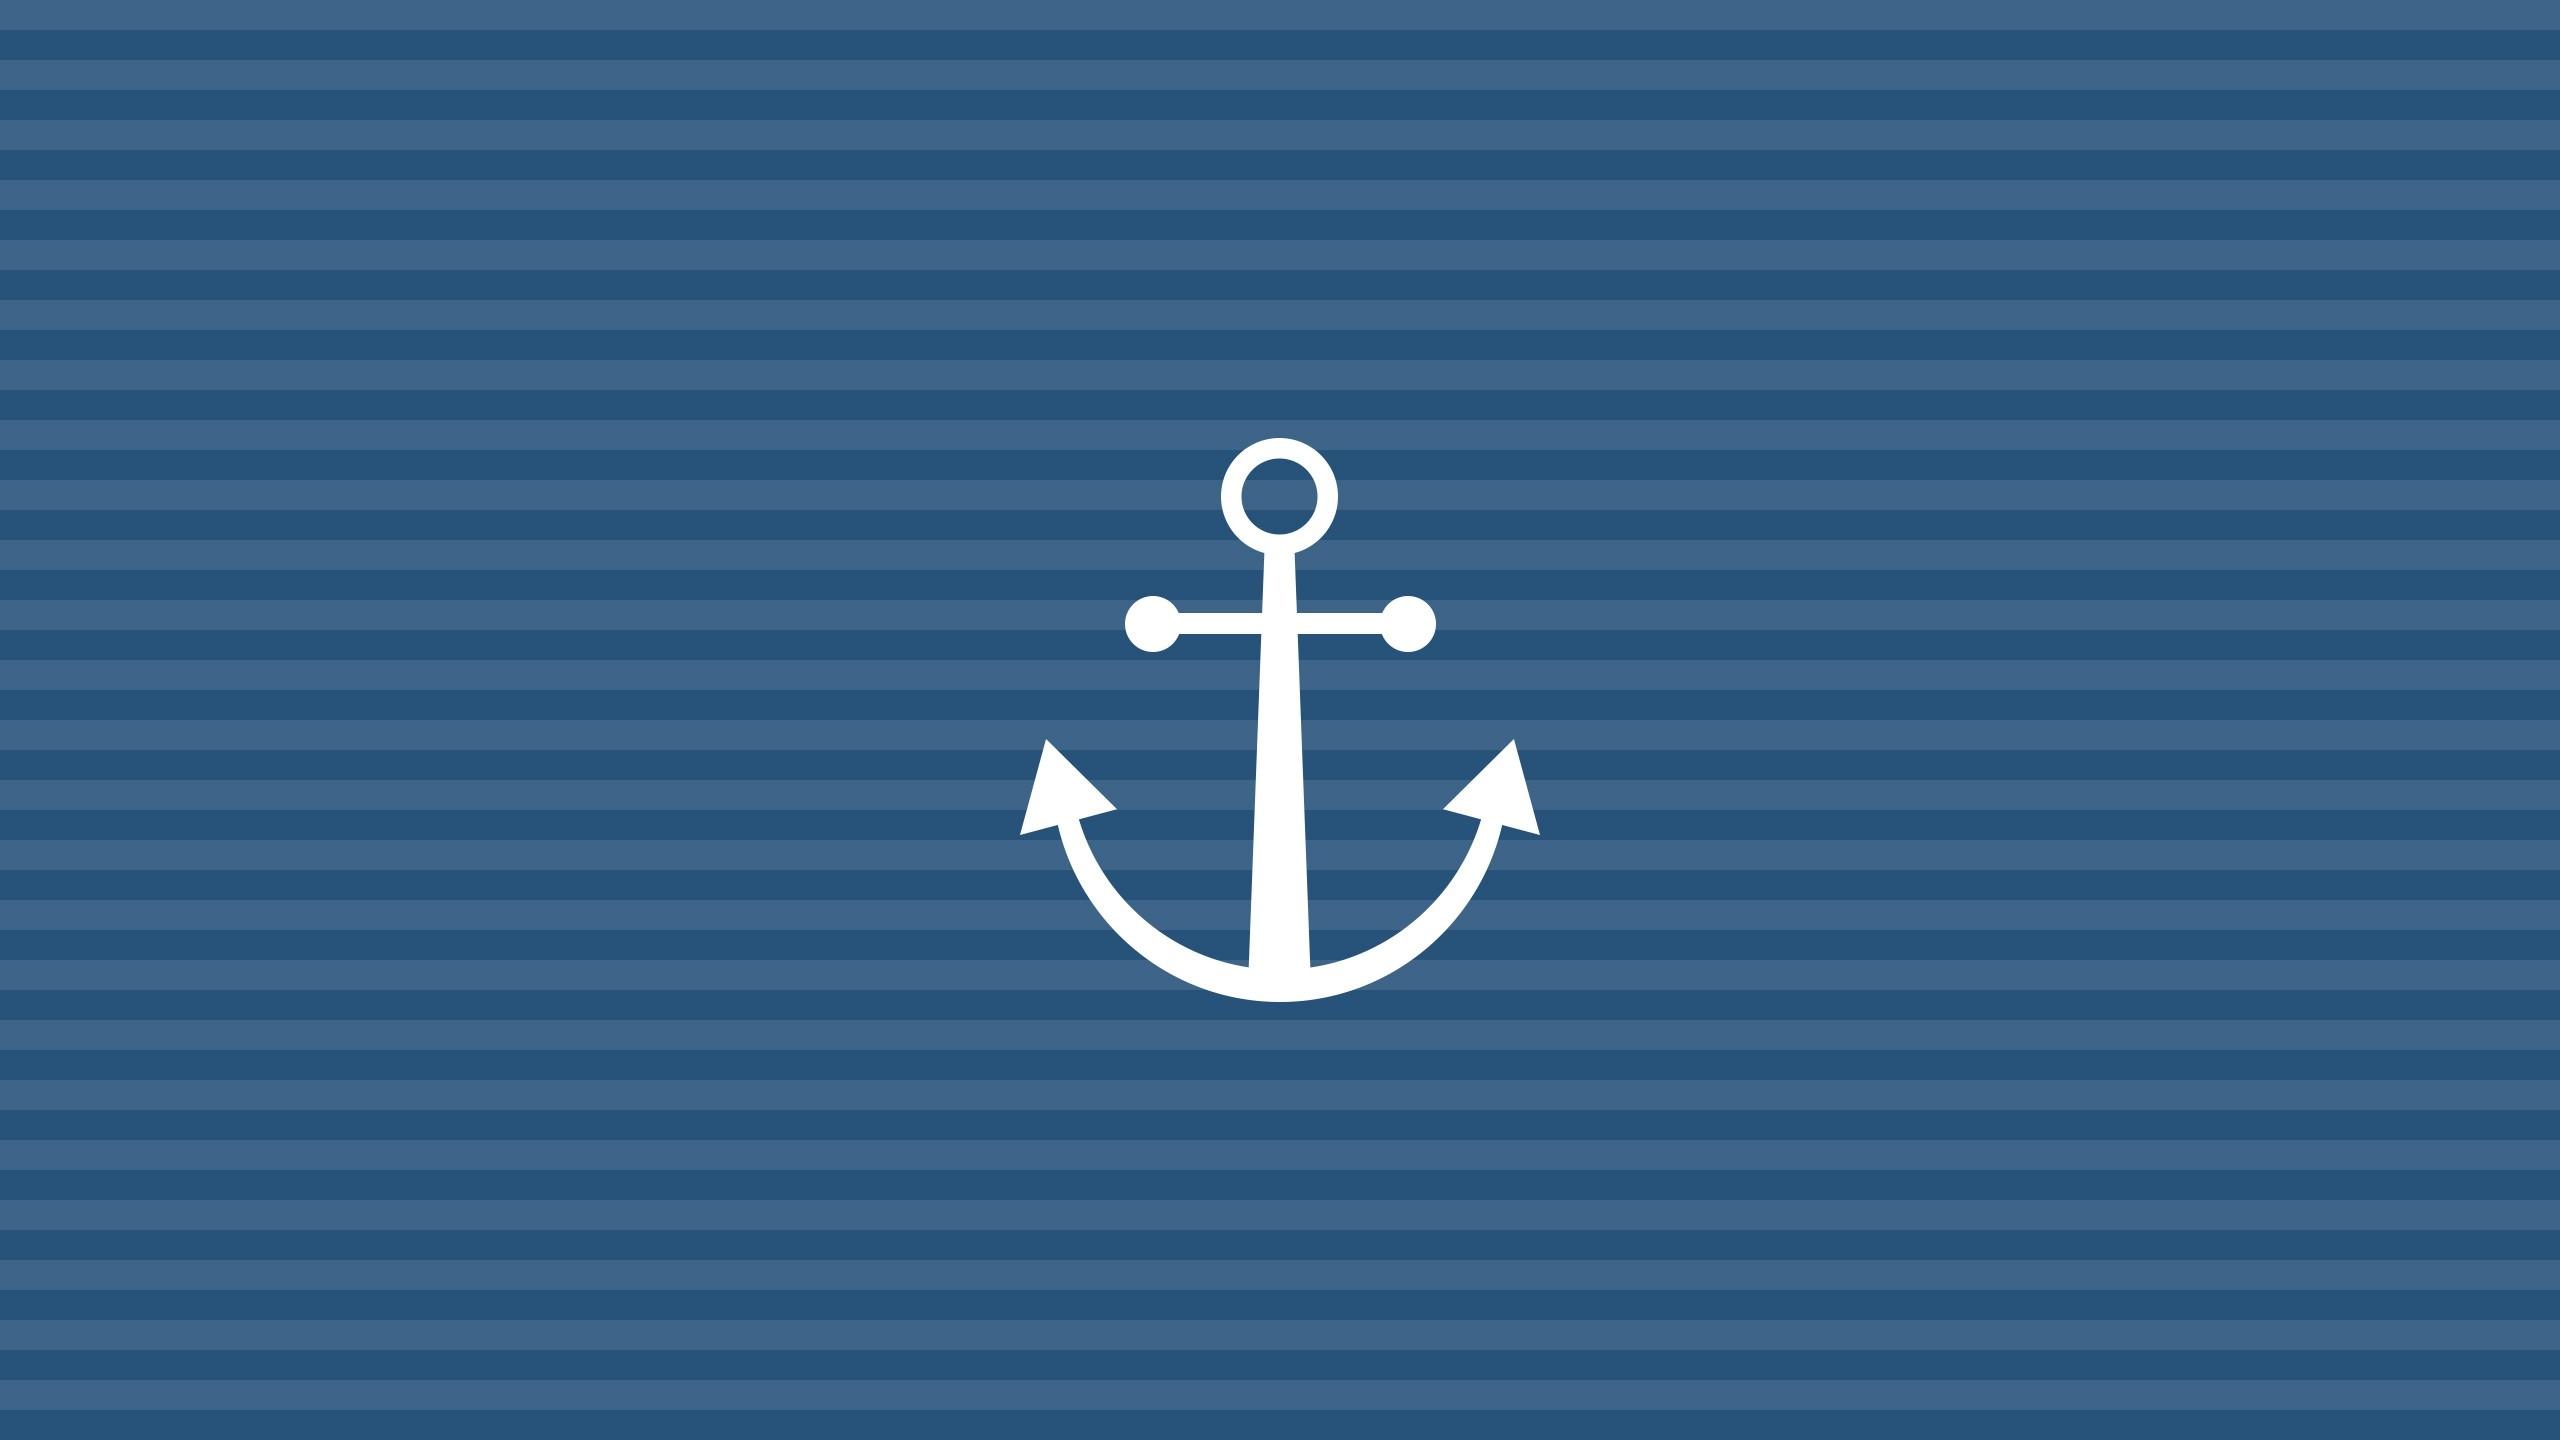 Res: 2560x1440, New nautical desktop wallpaper Gallery - anchor wallpapers